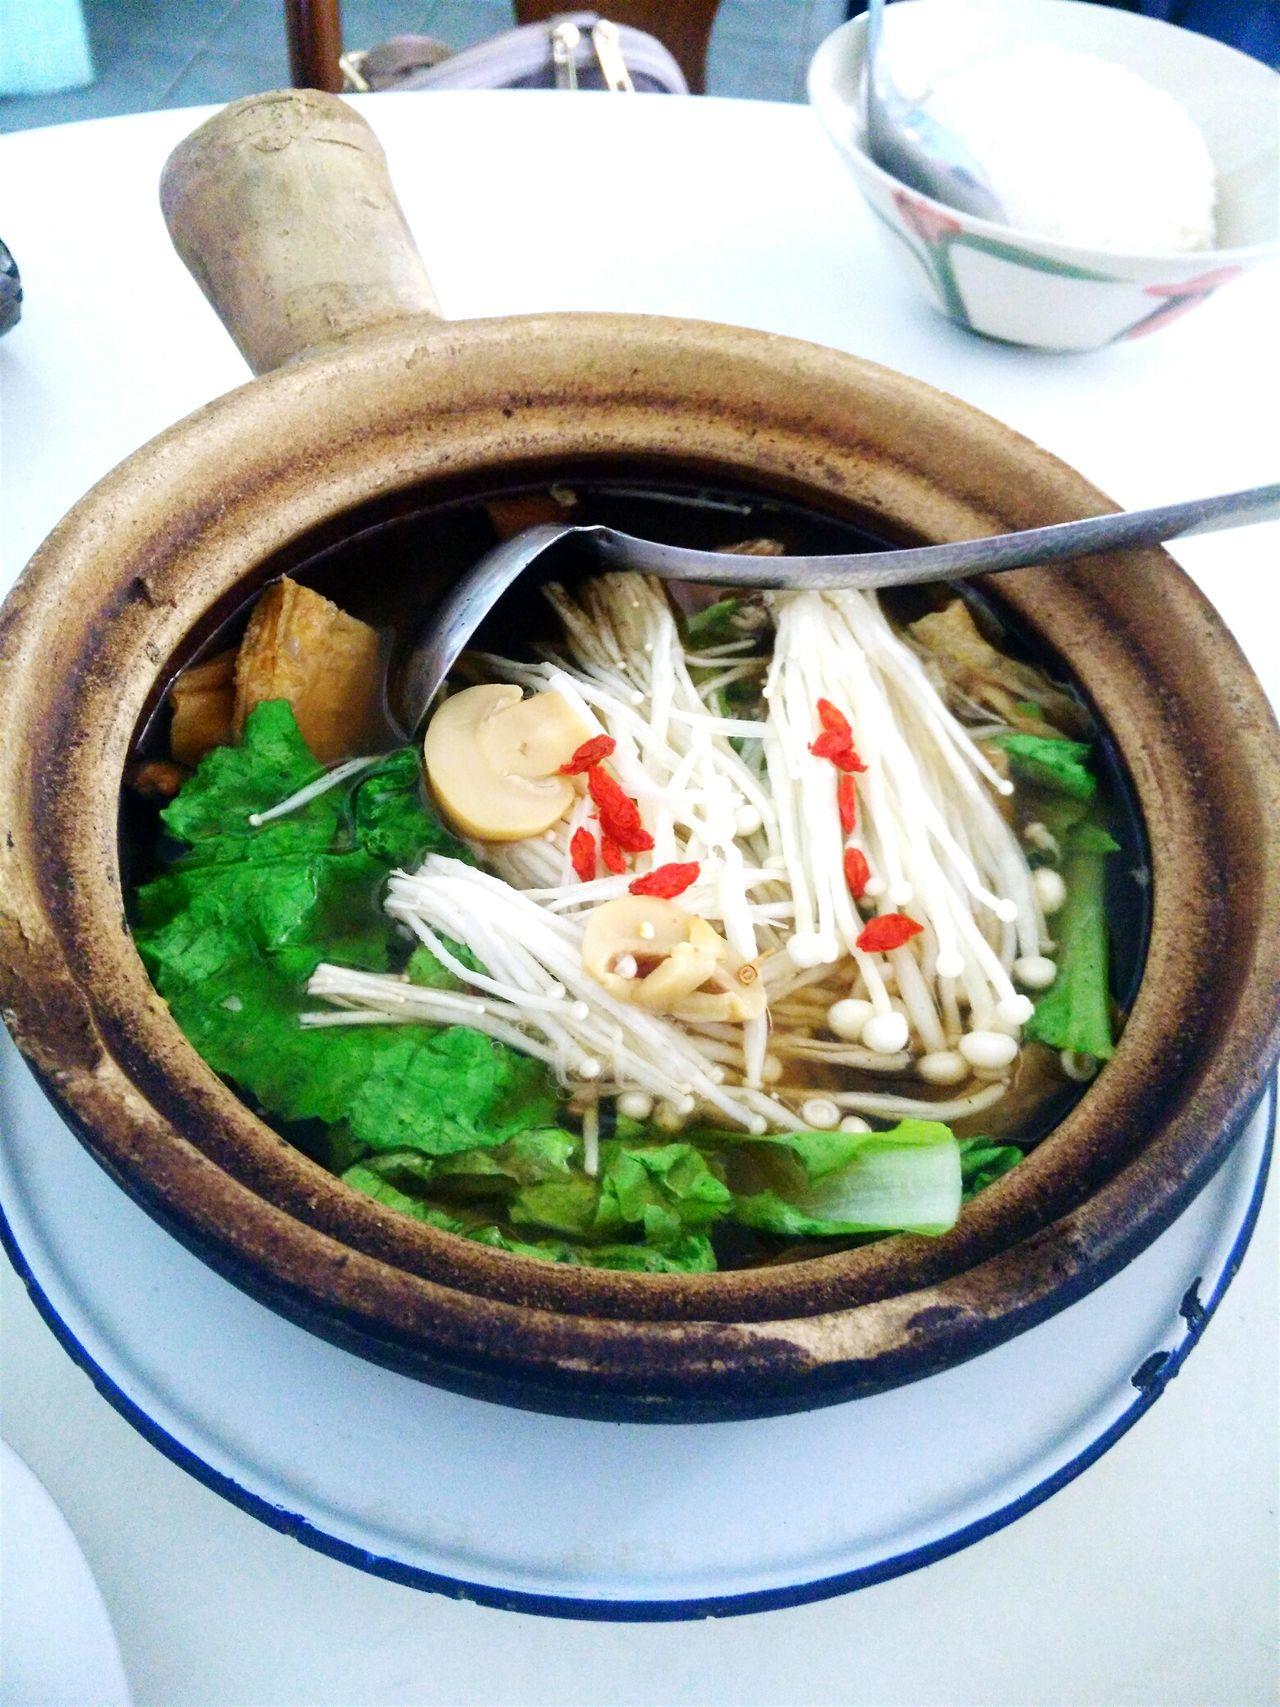 Bak kut teh Food Nakhon Si Thammarat Bowl Ko-pi โกปี้